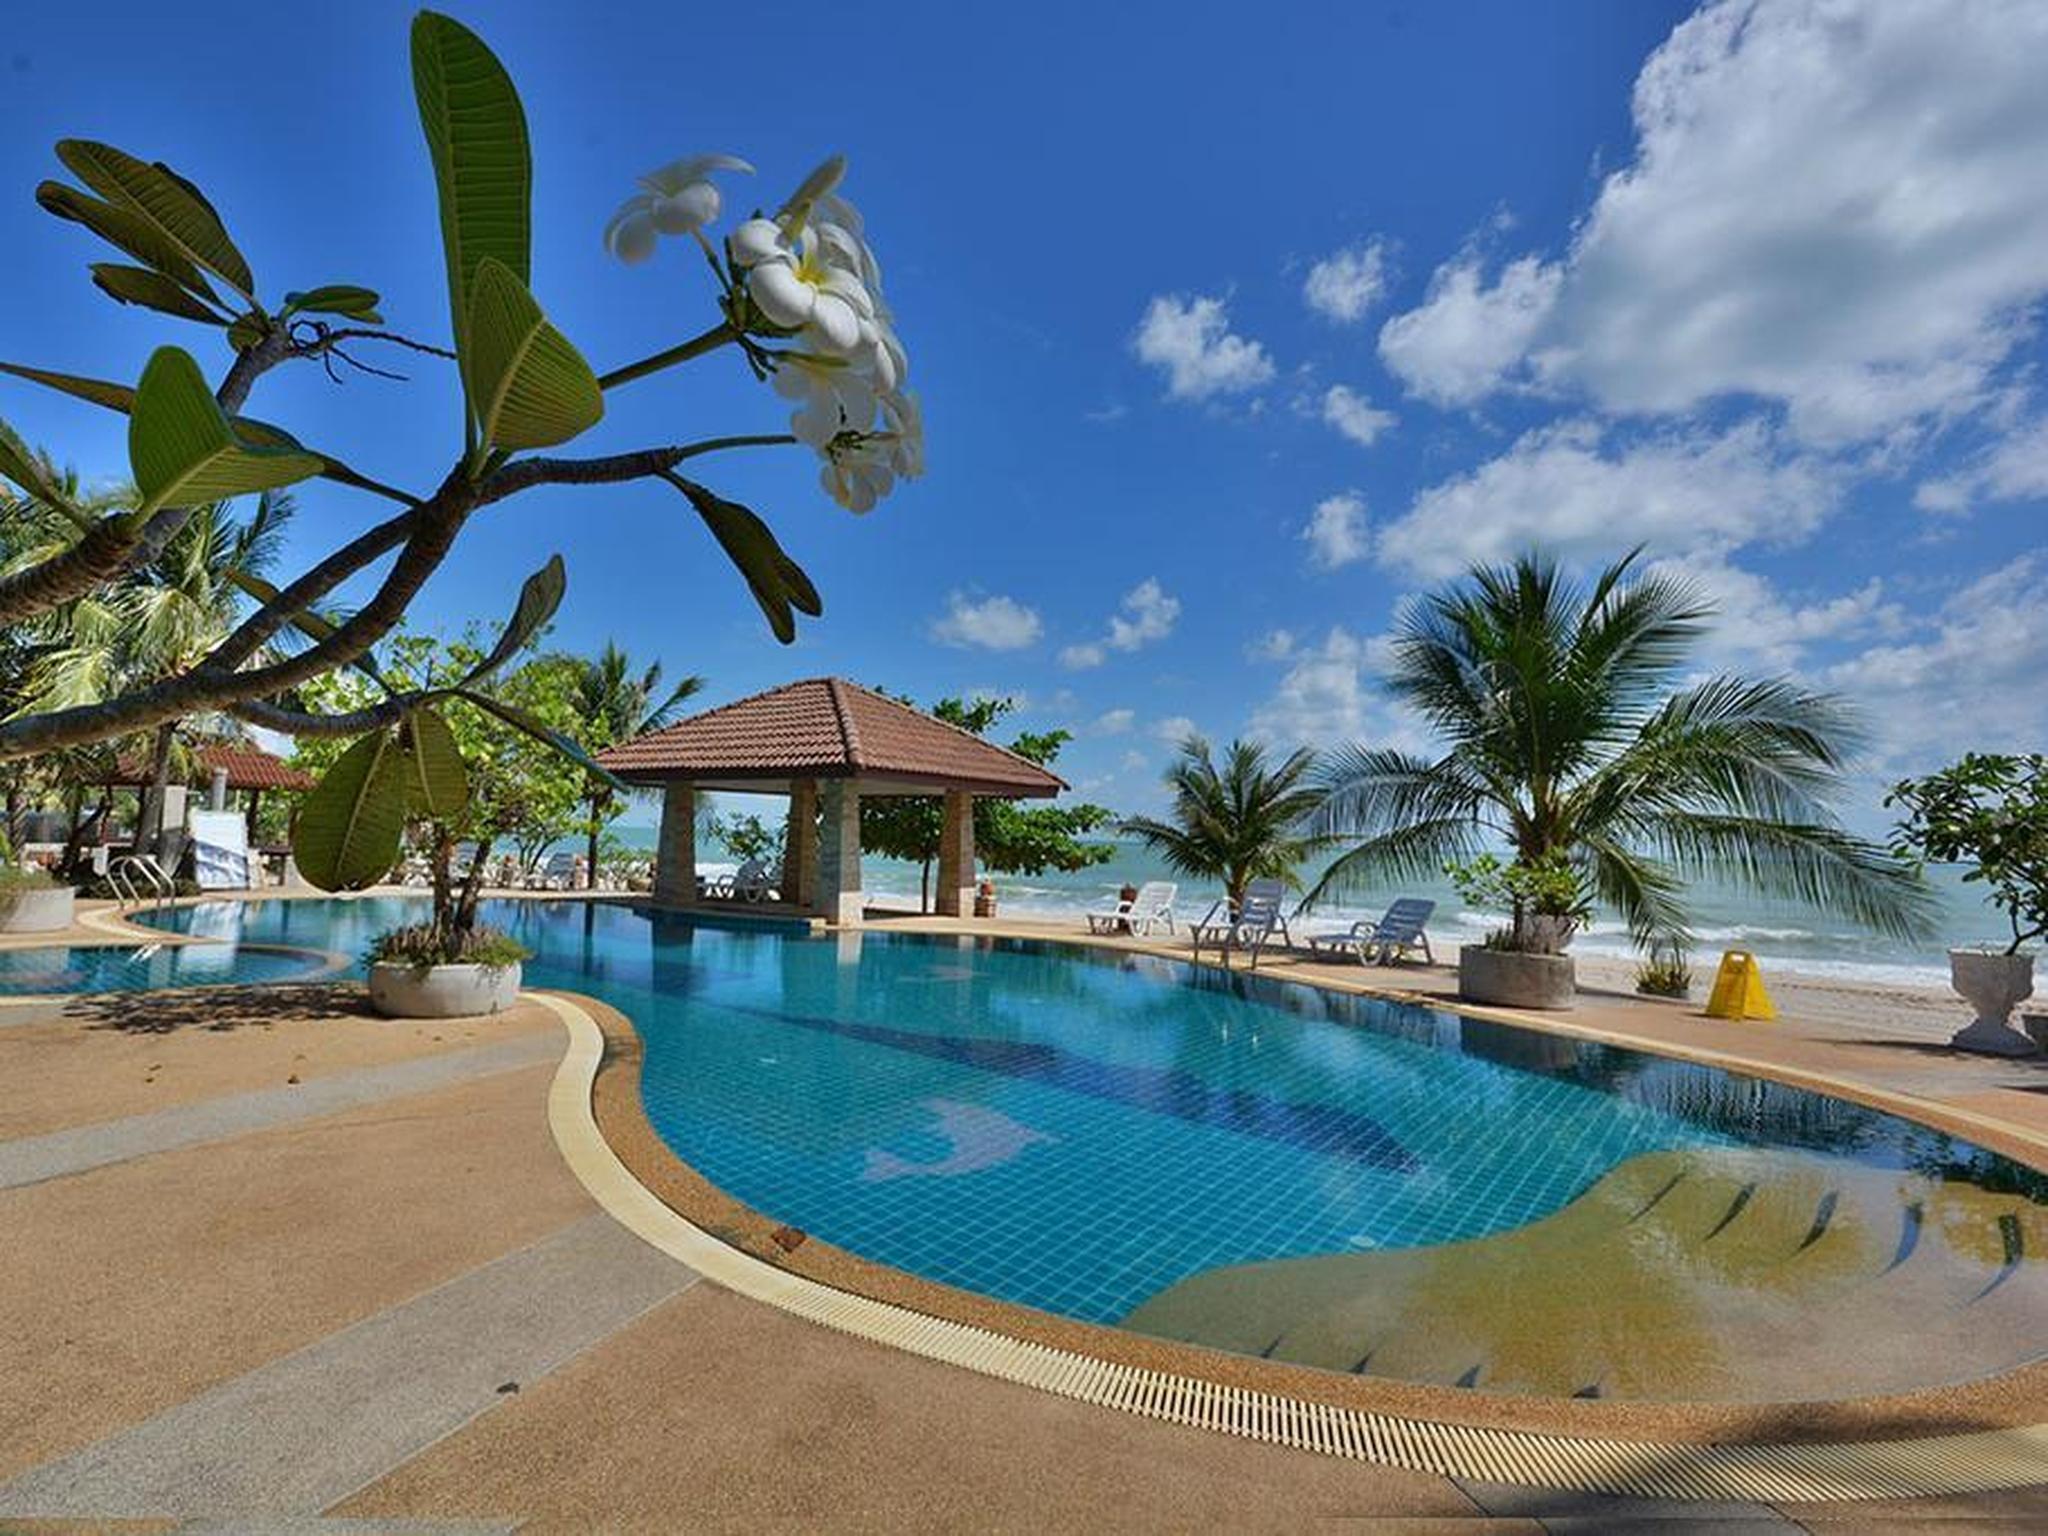 alongkot beach resort khanom in khanom nakhon si thammarat room rh agoda com